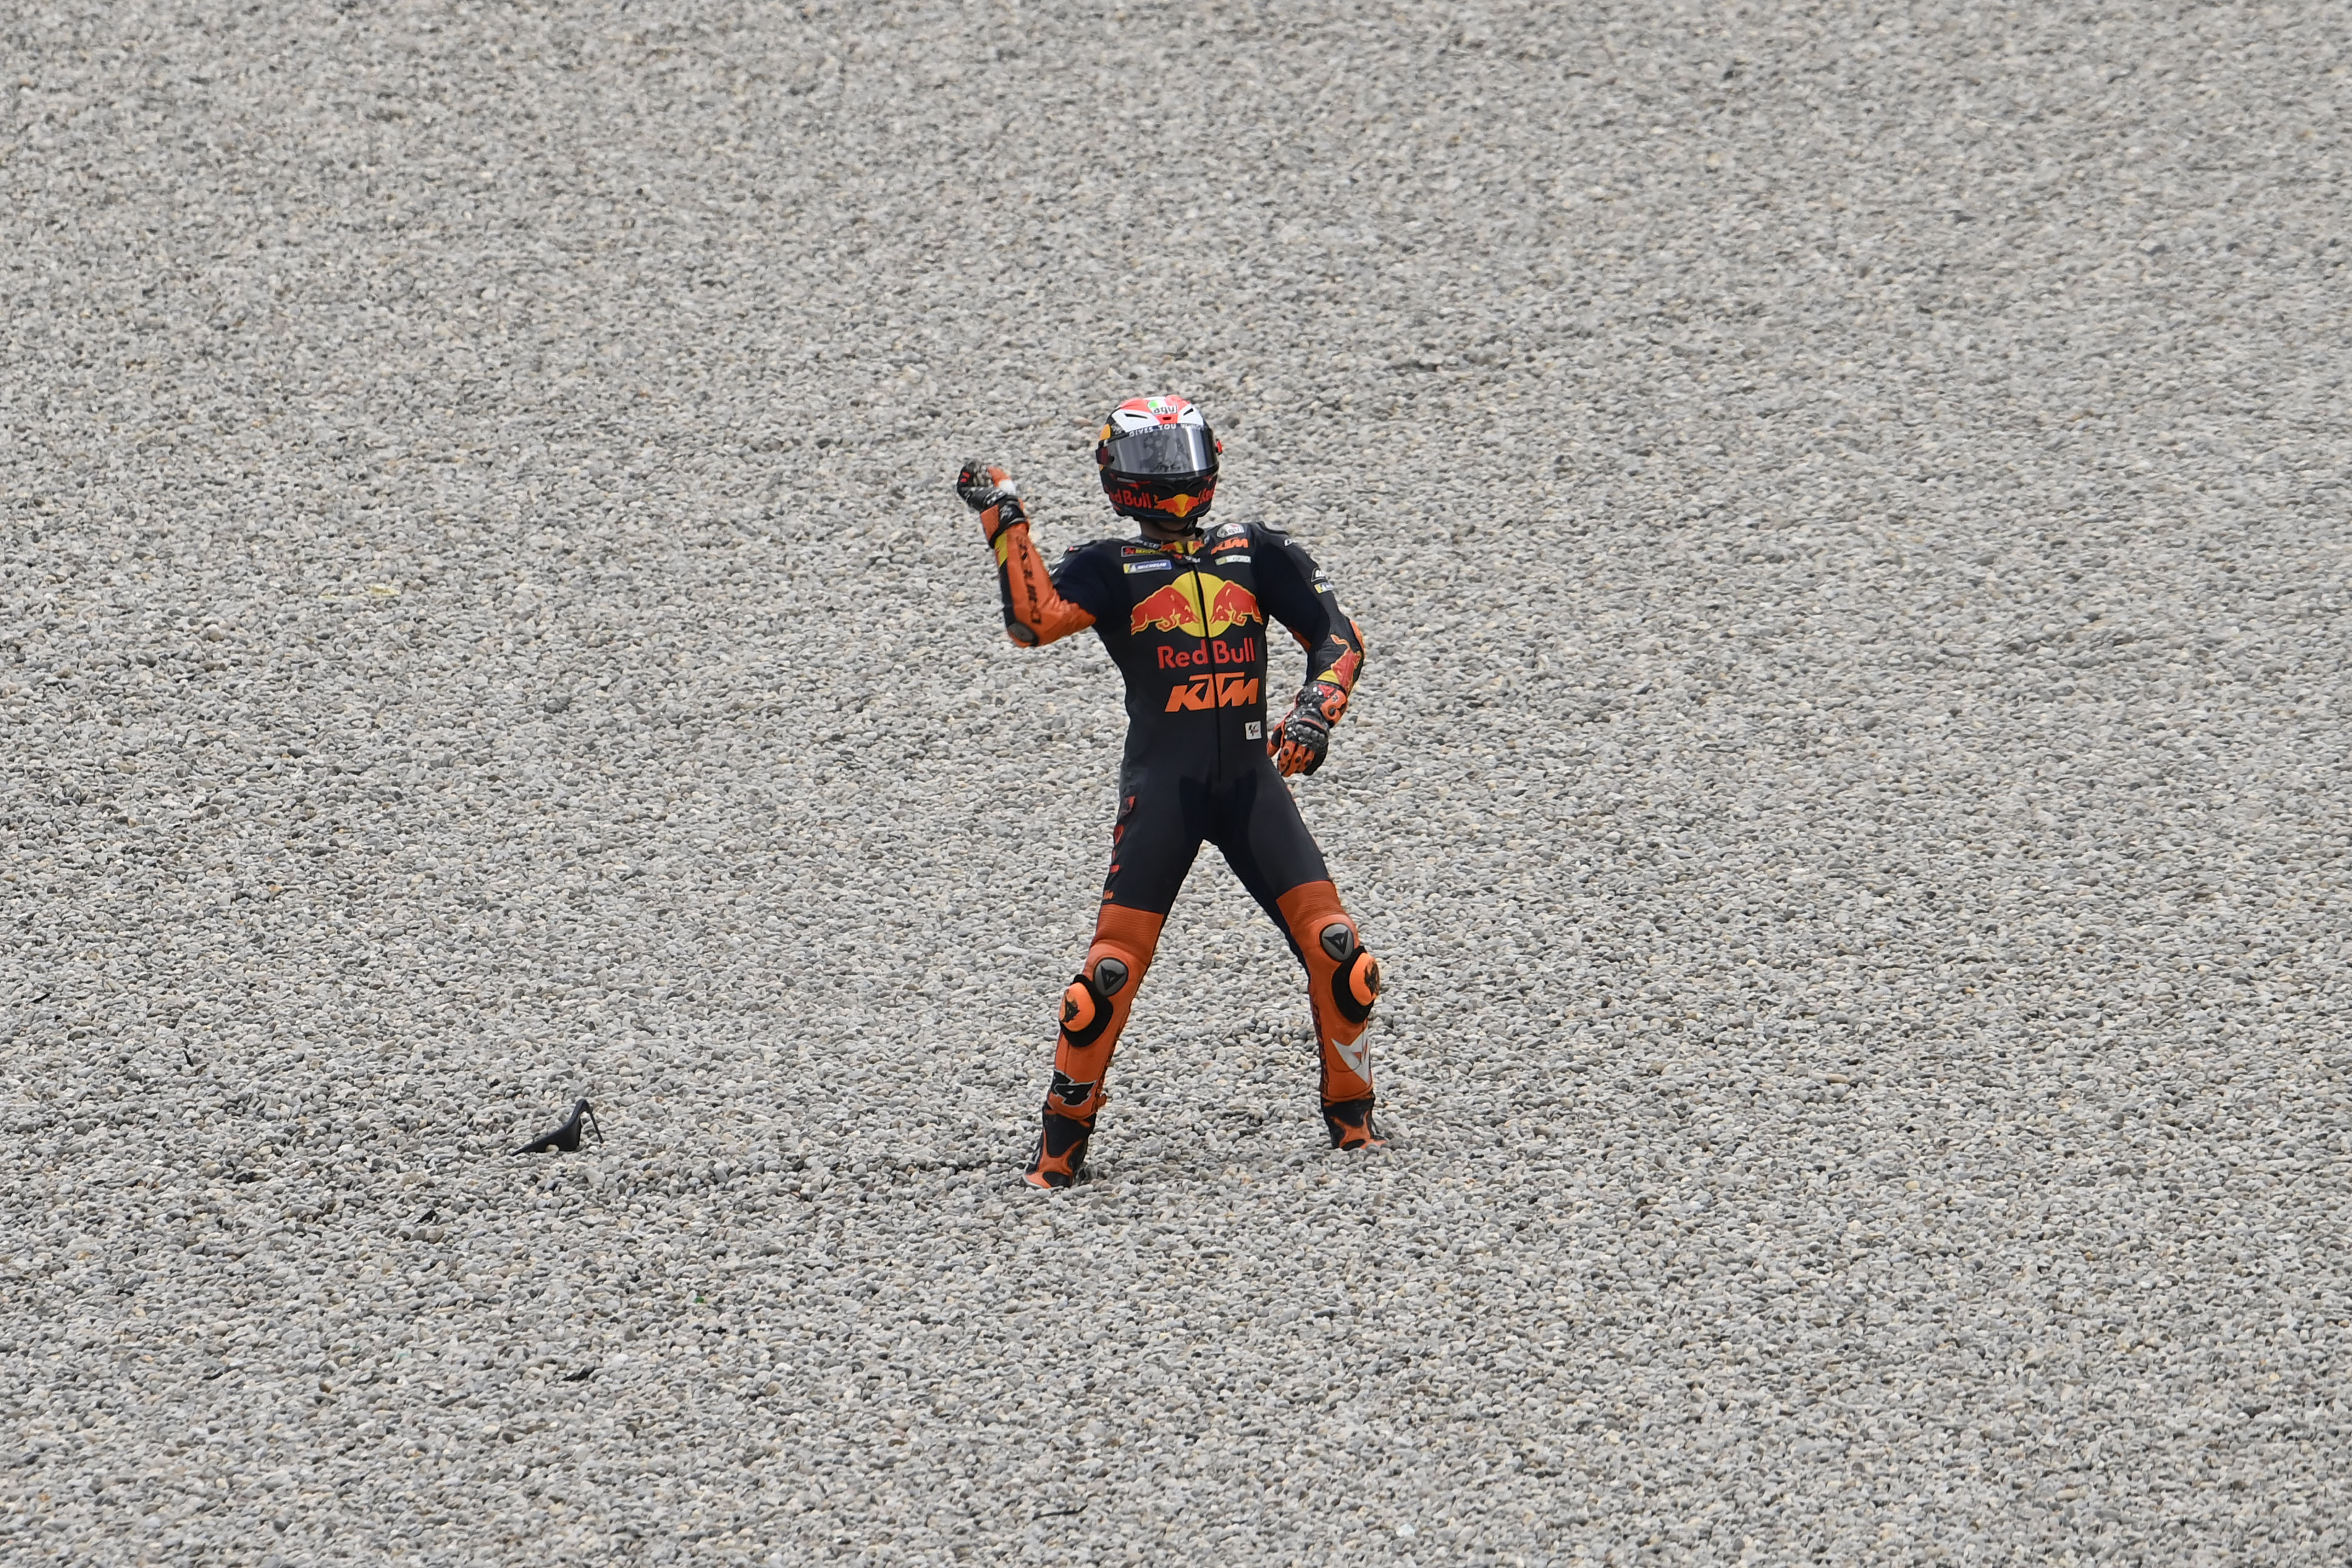 Pol Espargaro crash Barcelona MotoGP 2020